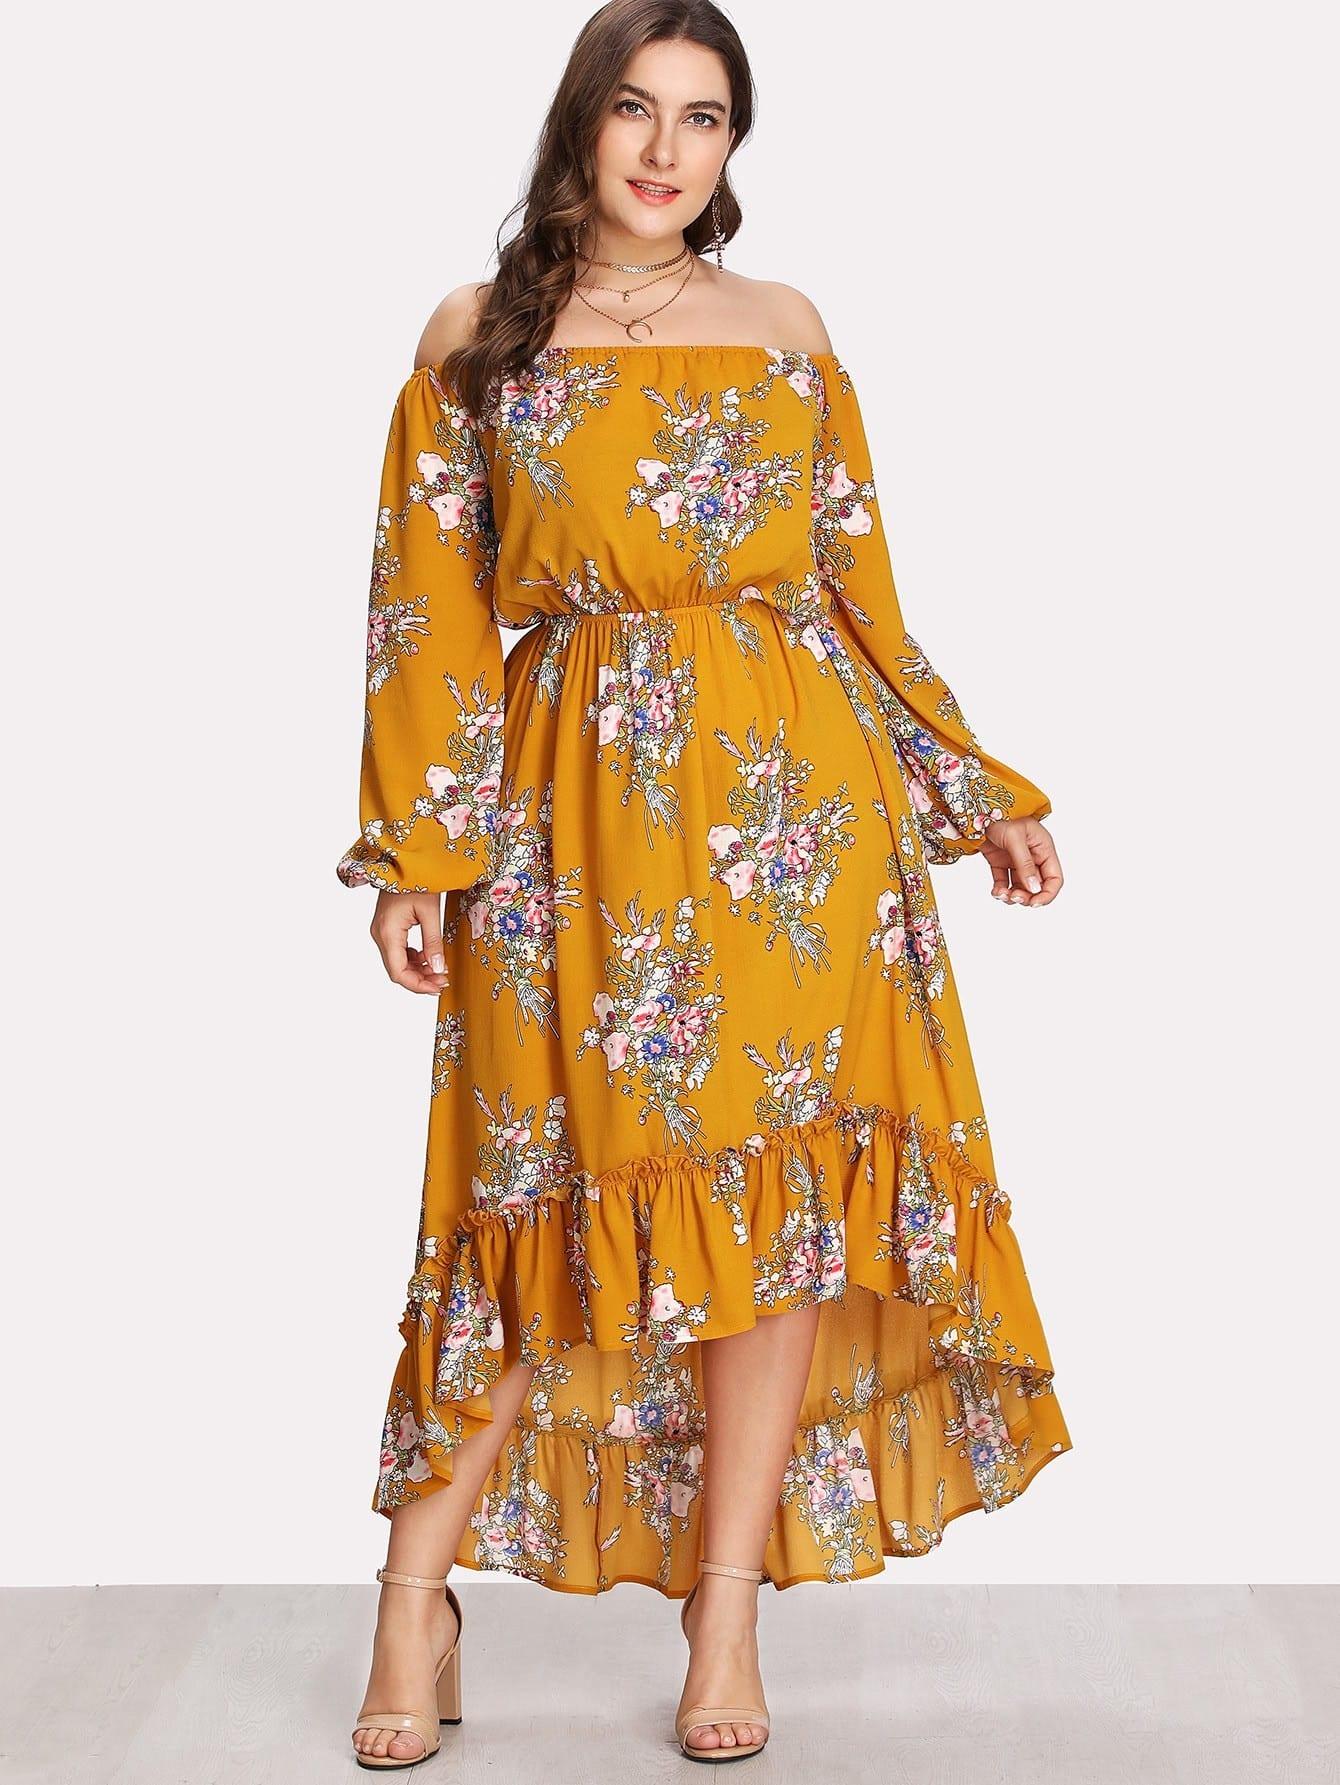 Plus Lantern Sleeve Ruffle Dip Hem Bardot Dress striped sleeve ruffle dip hem dress